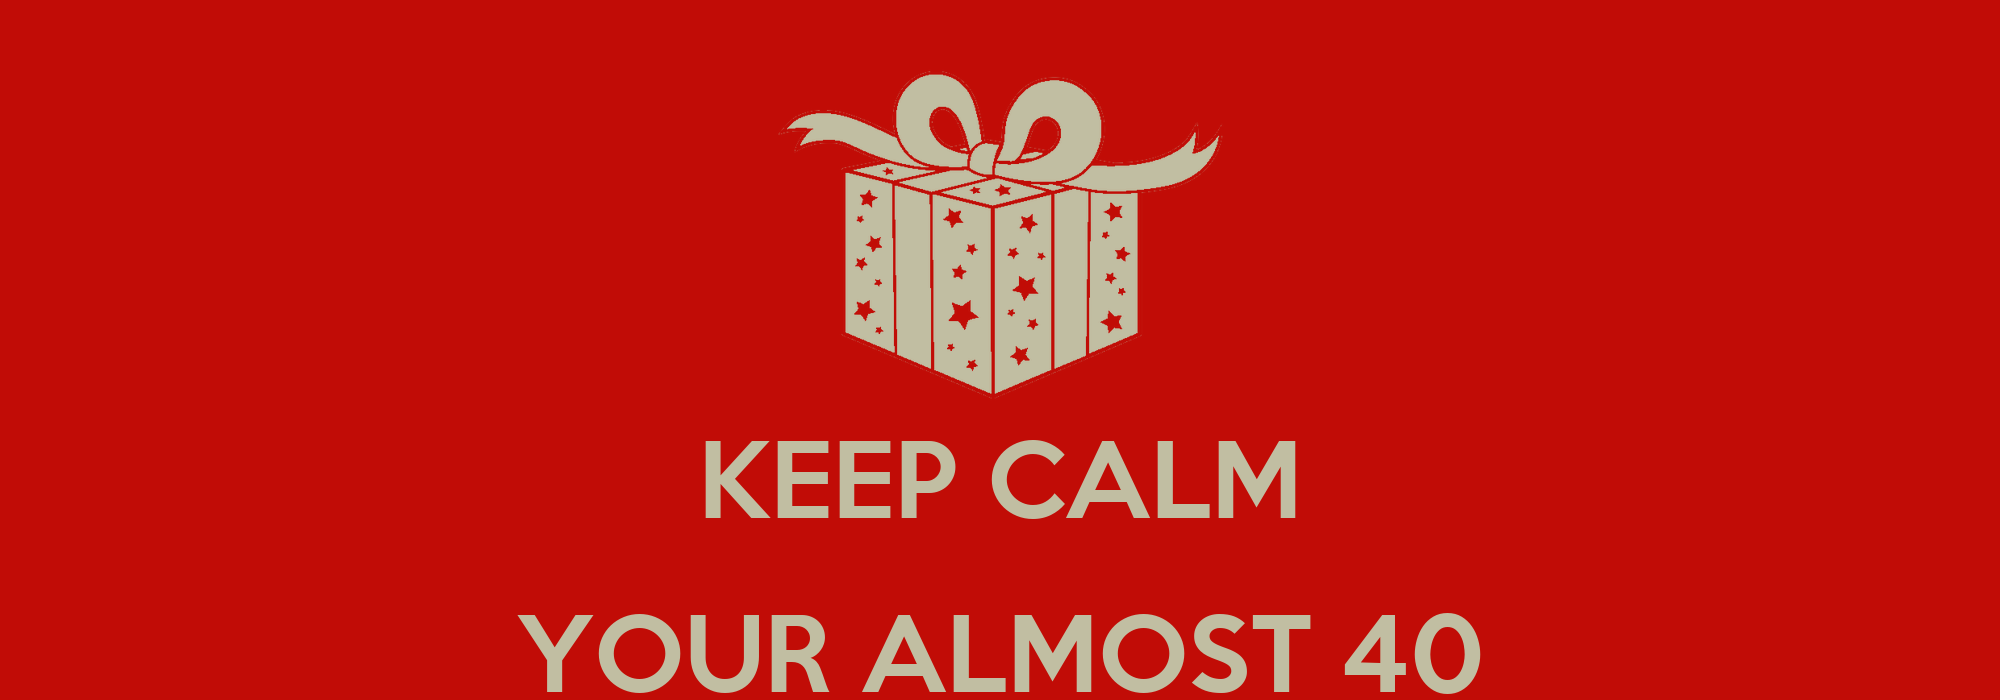 keep calm your almost 40 poster doum keep calmomatic